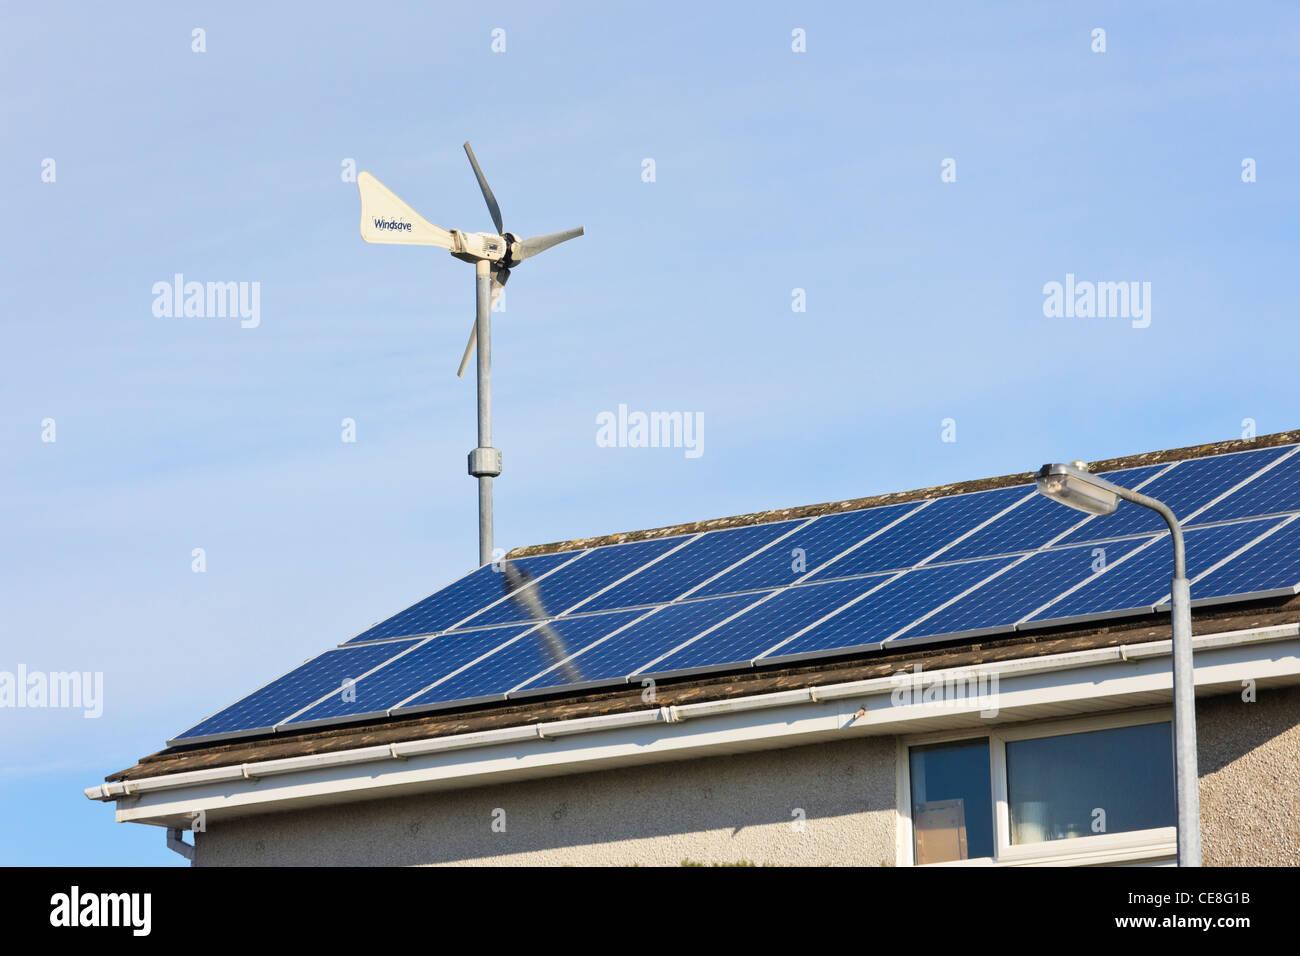 Uk Windsave Micro Wind Turbine And Solar Panels On A